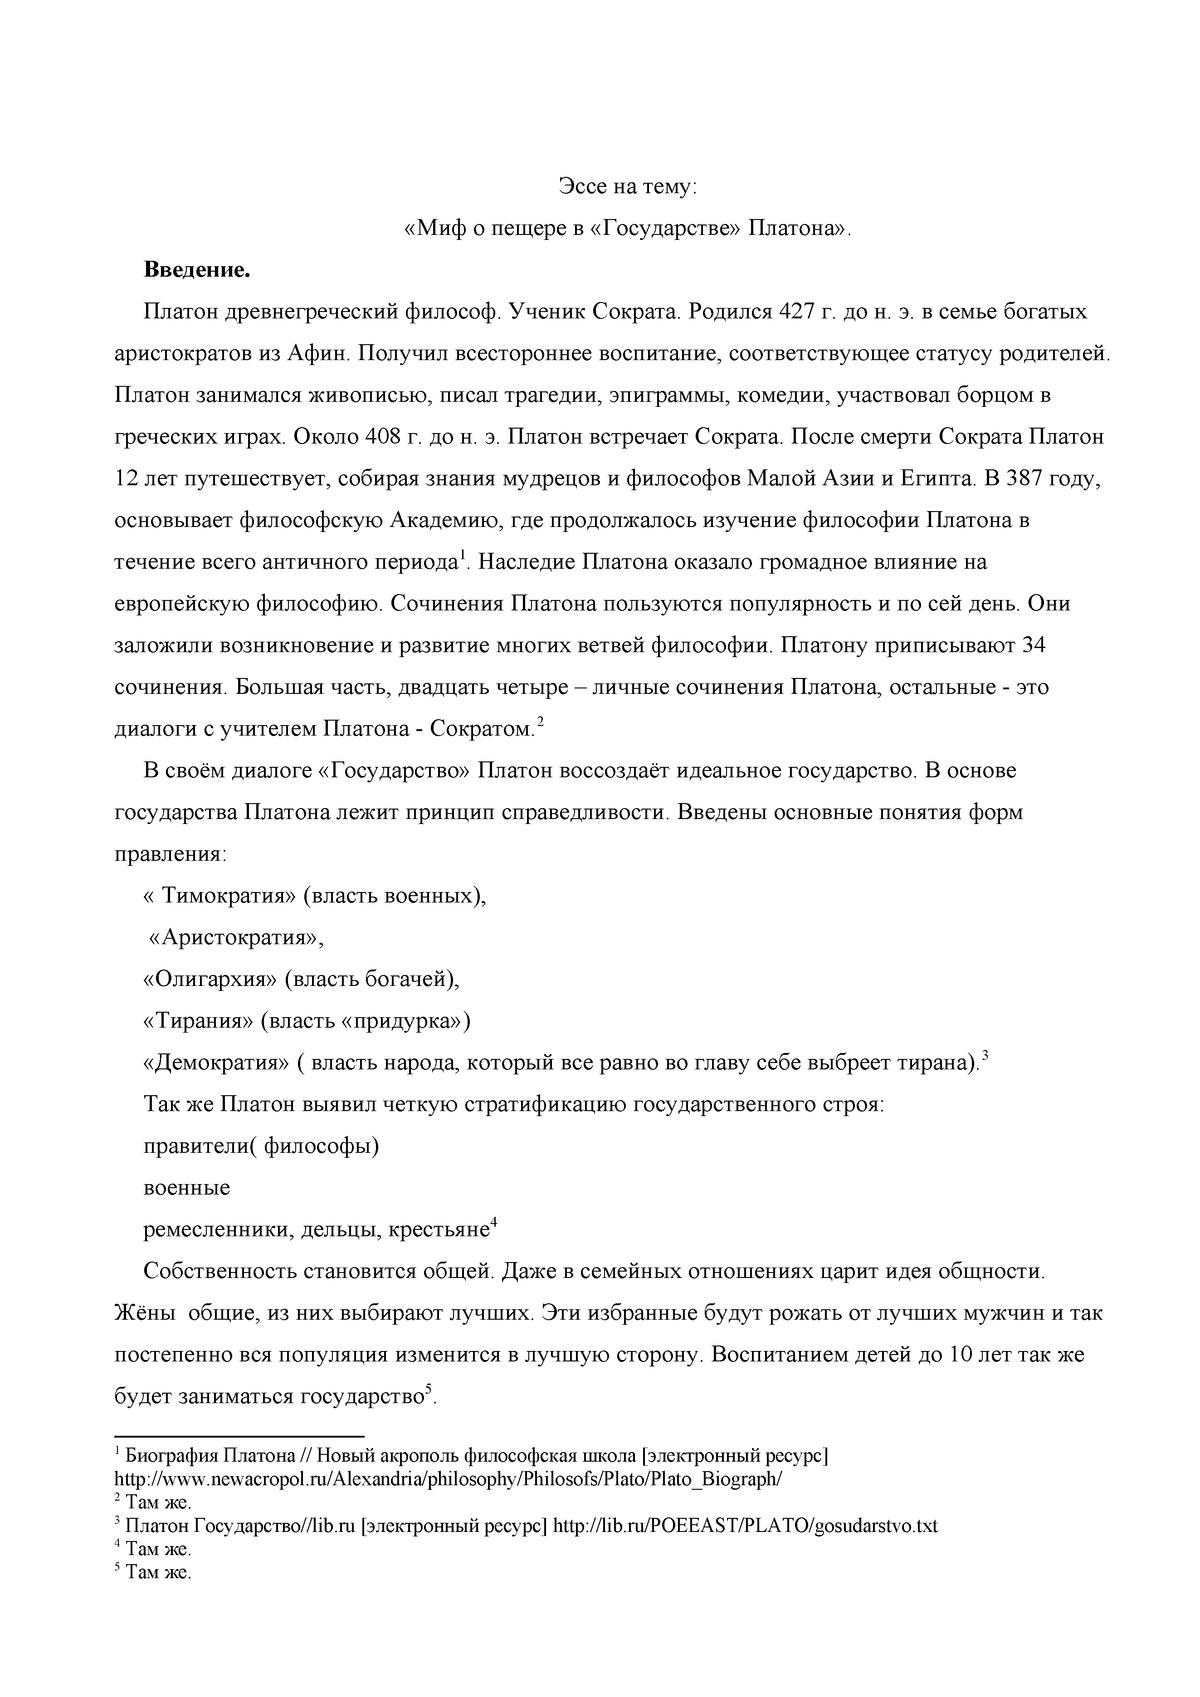 Эссе на тему платон 5937